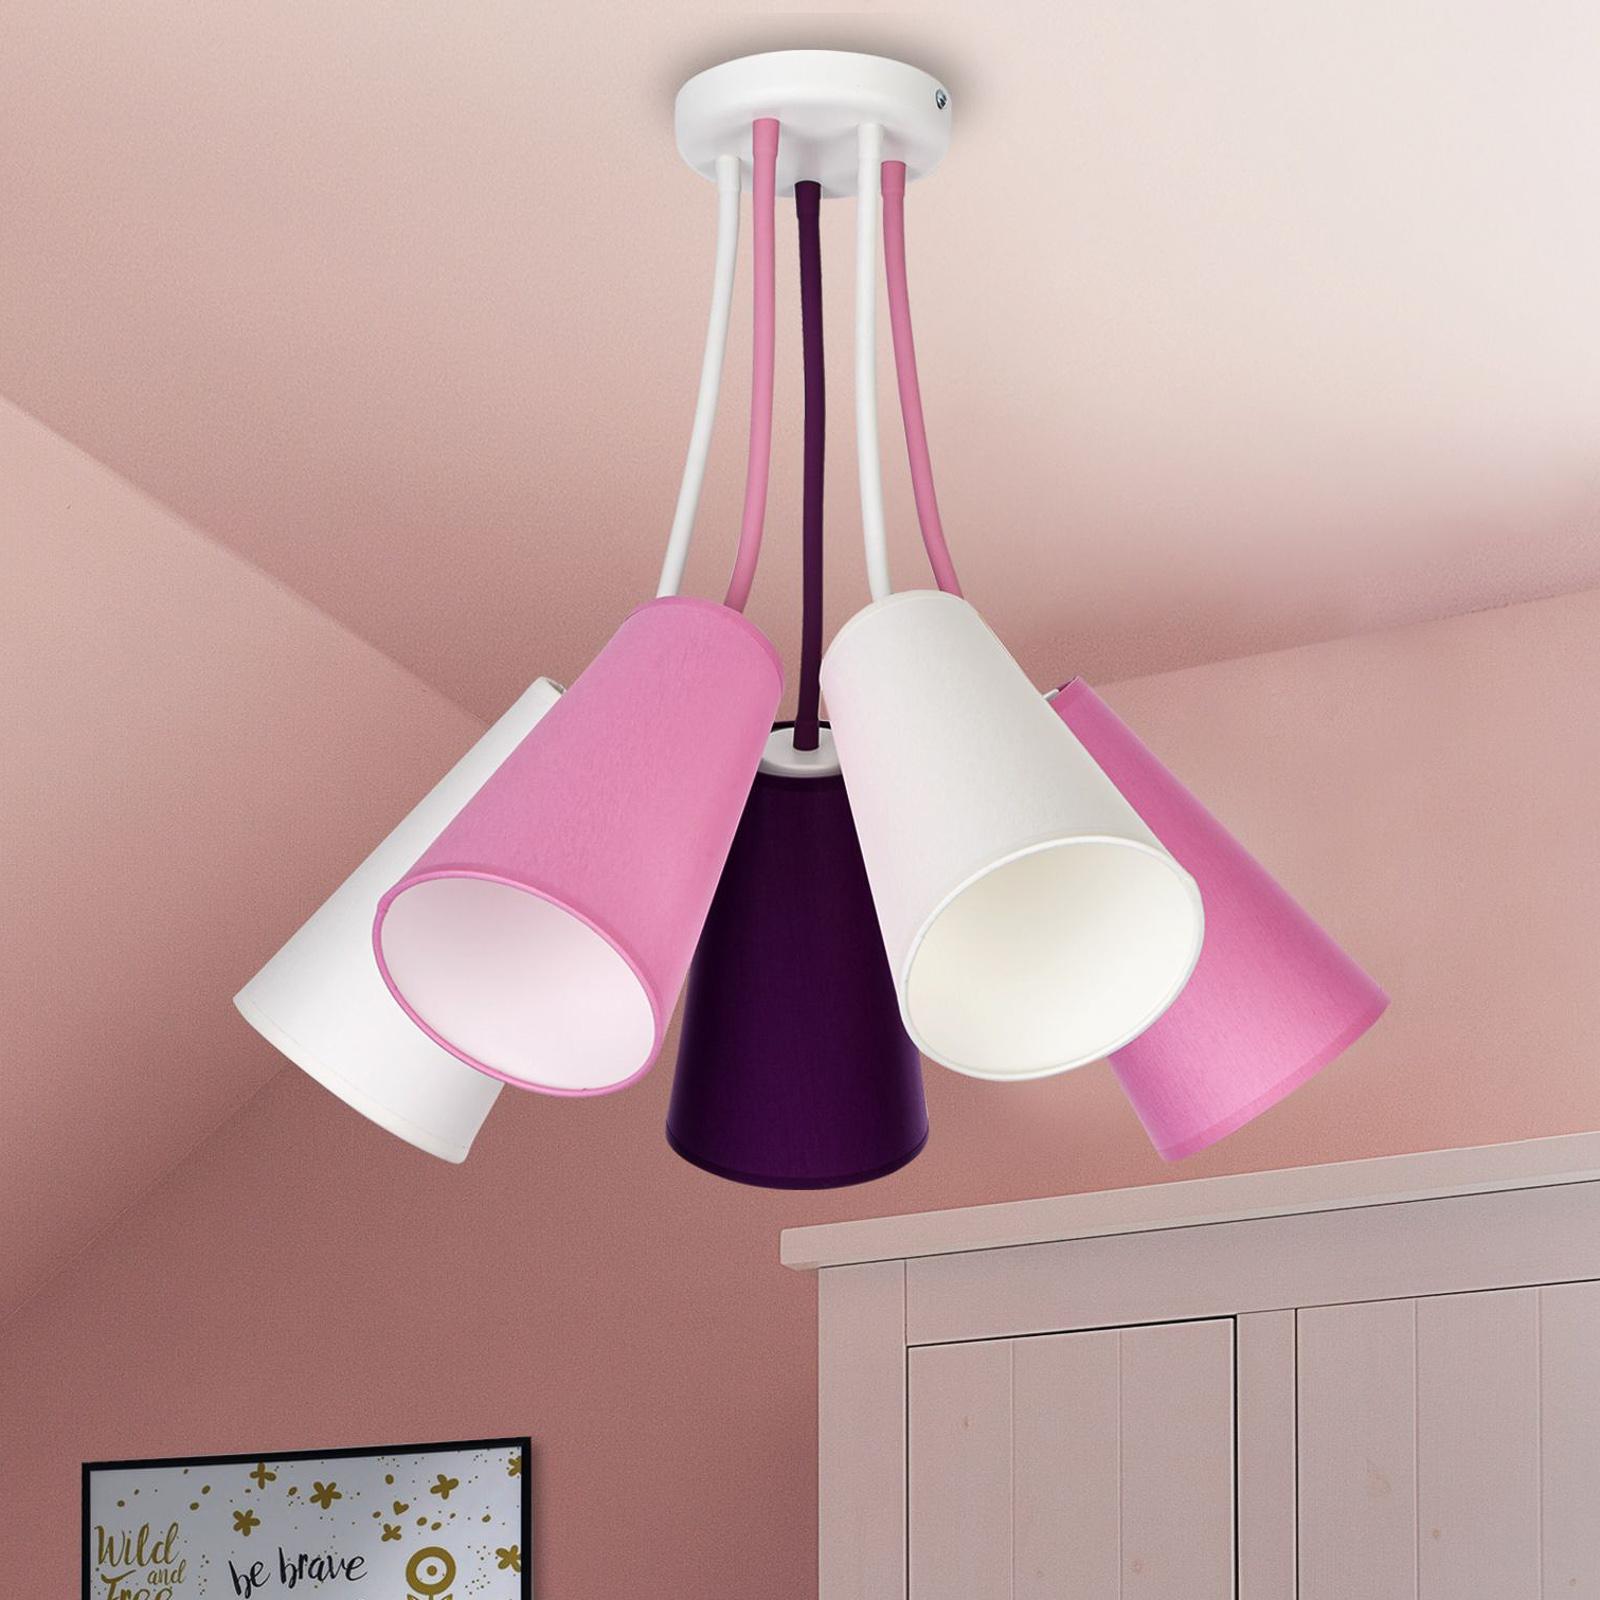 Plafondlamp Wire Kids 5-lamps, wit/roze/paars